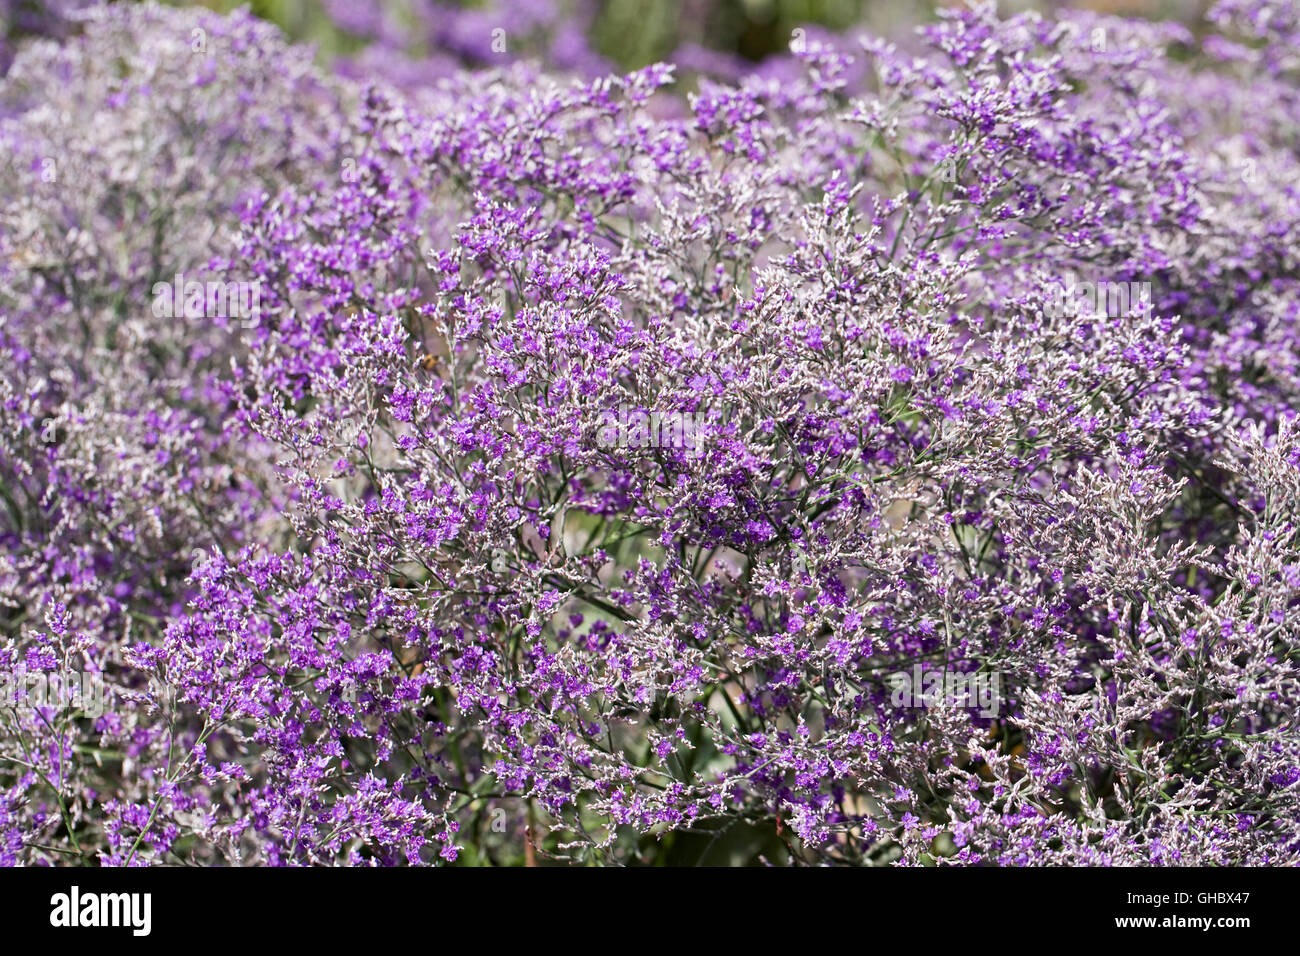 Limonium platyphyllum 'Violetta'. Broad leaved statice. - Stock Image